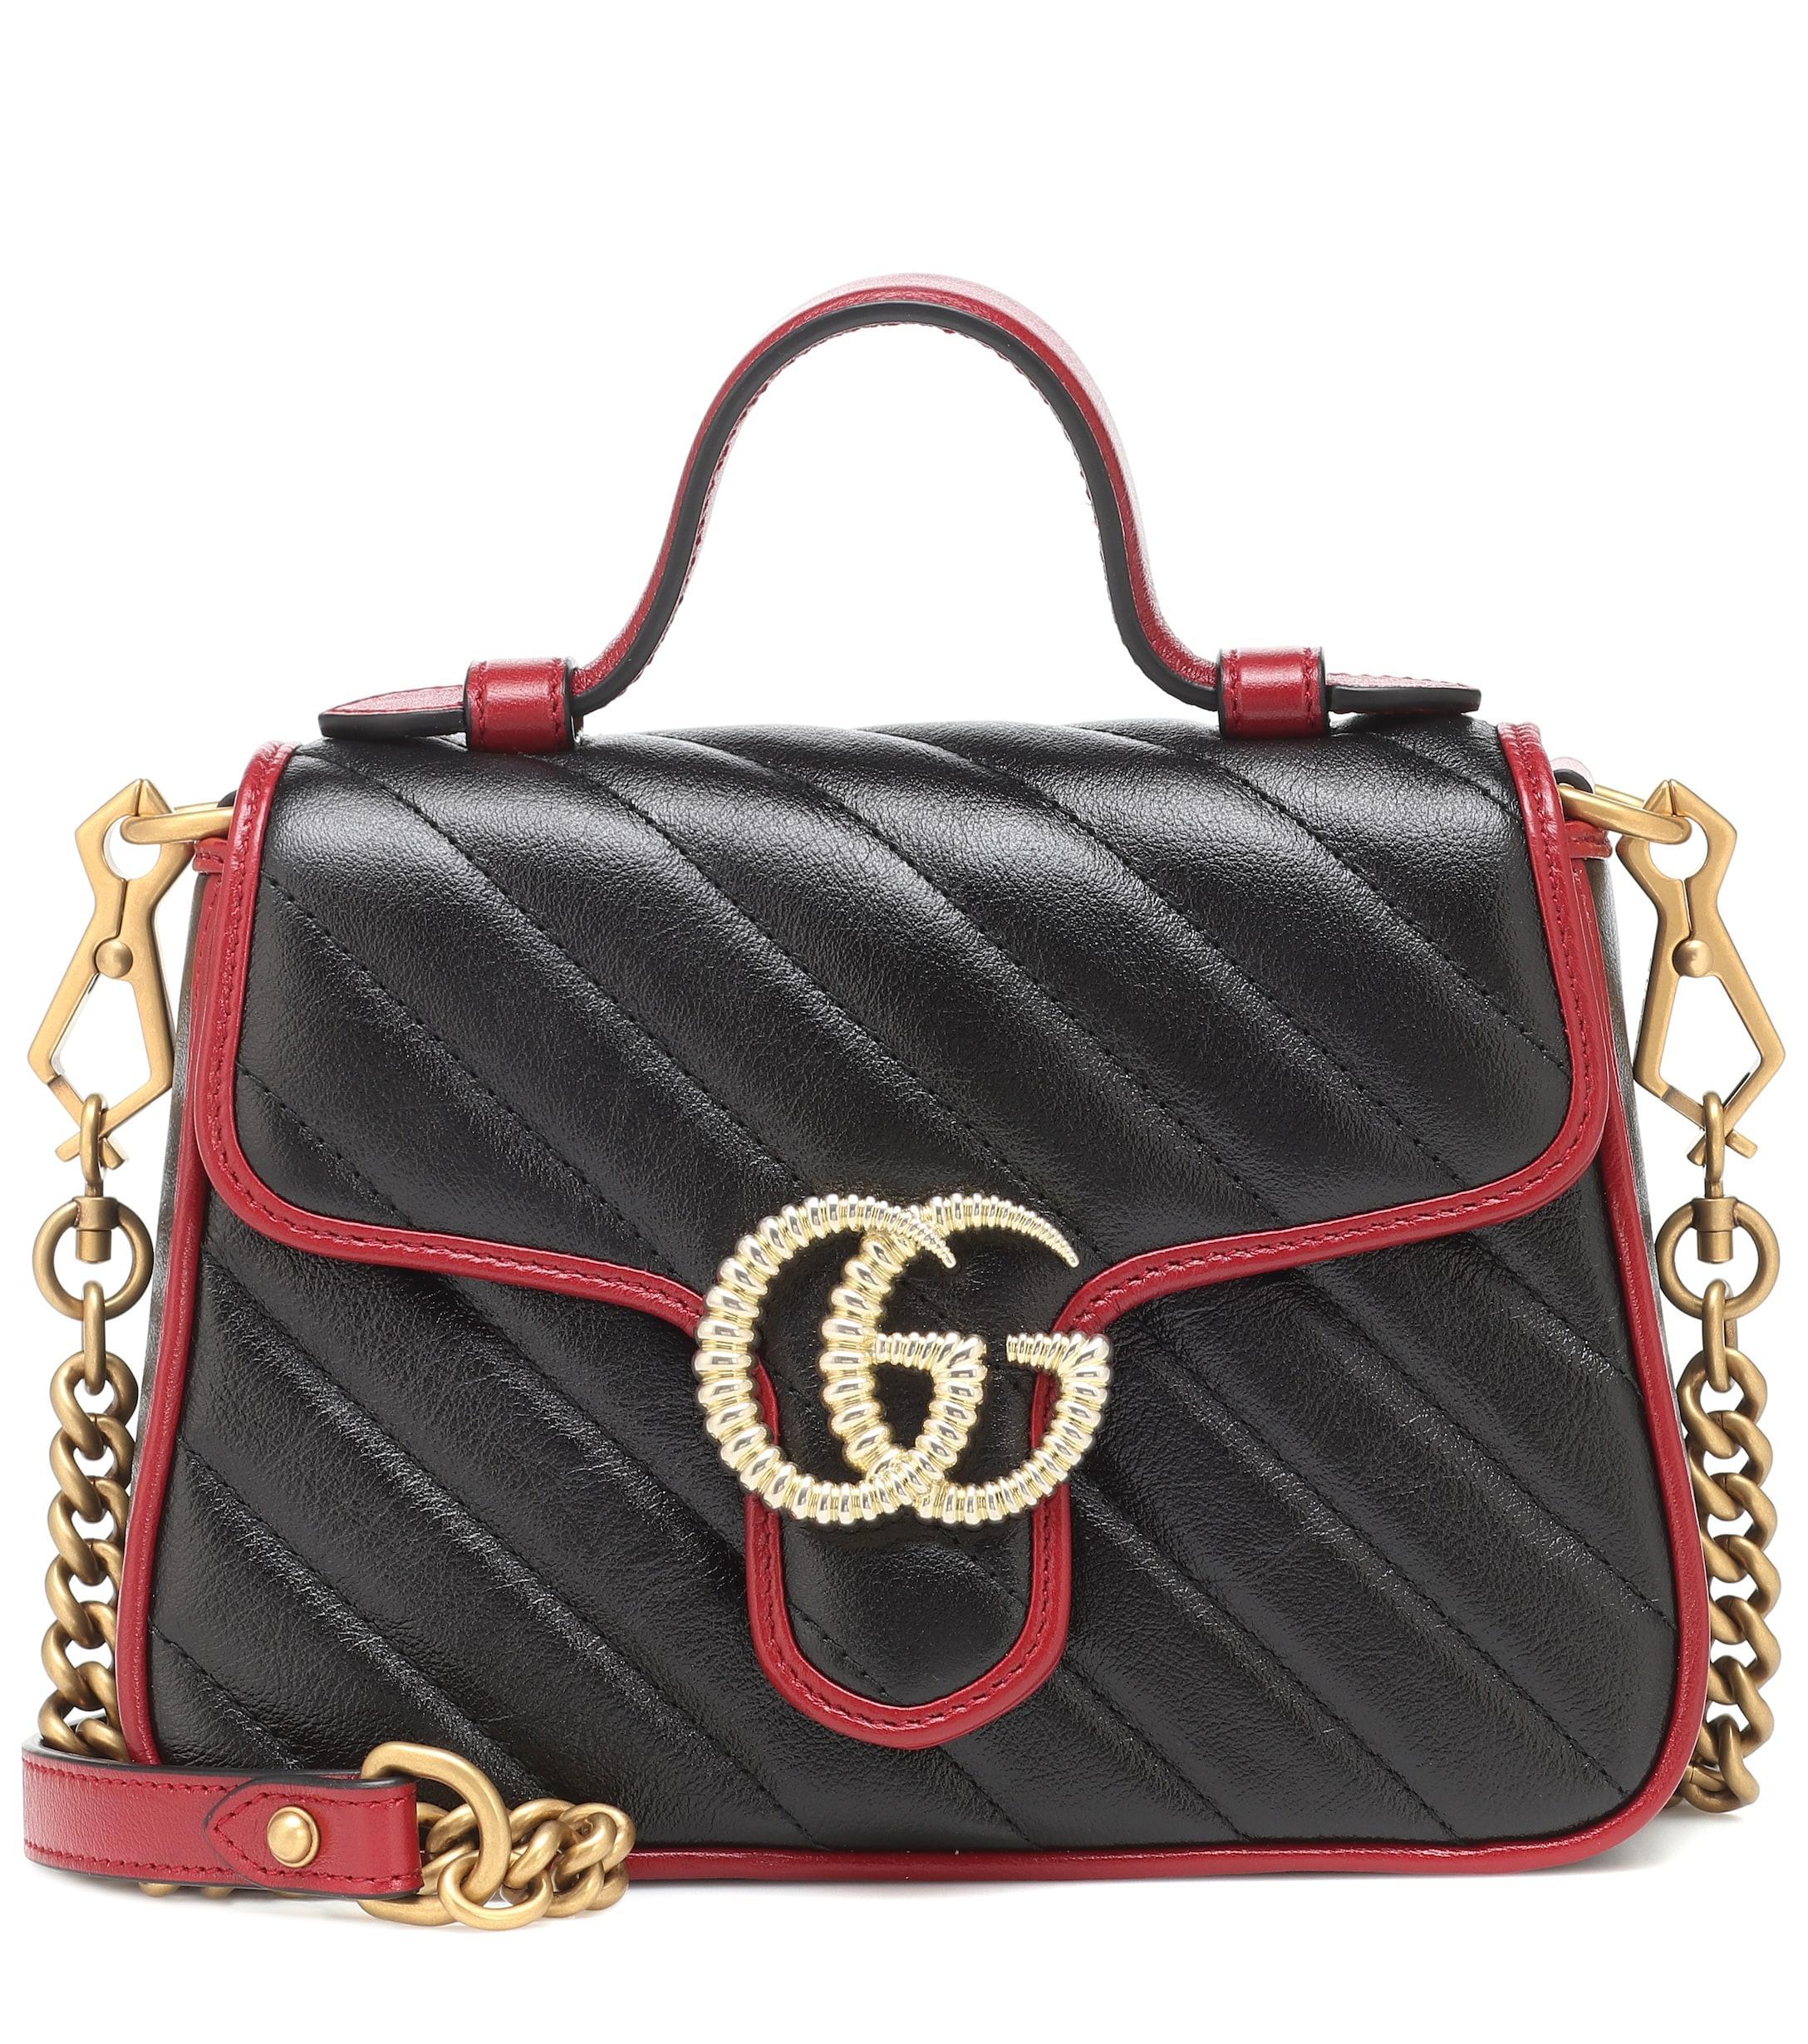 Gucci Marmont New Gg Matelasse Mini Black Calf Leather